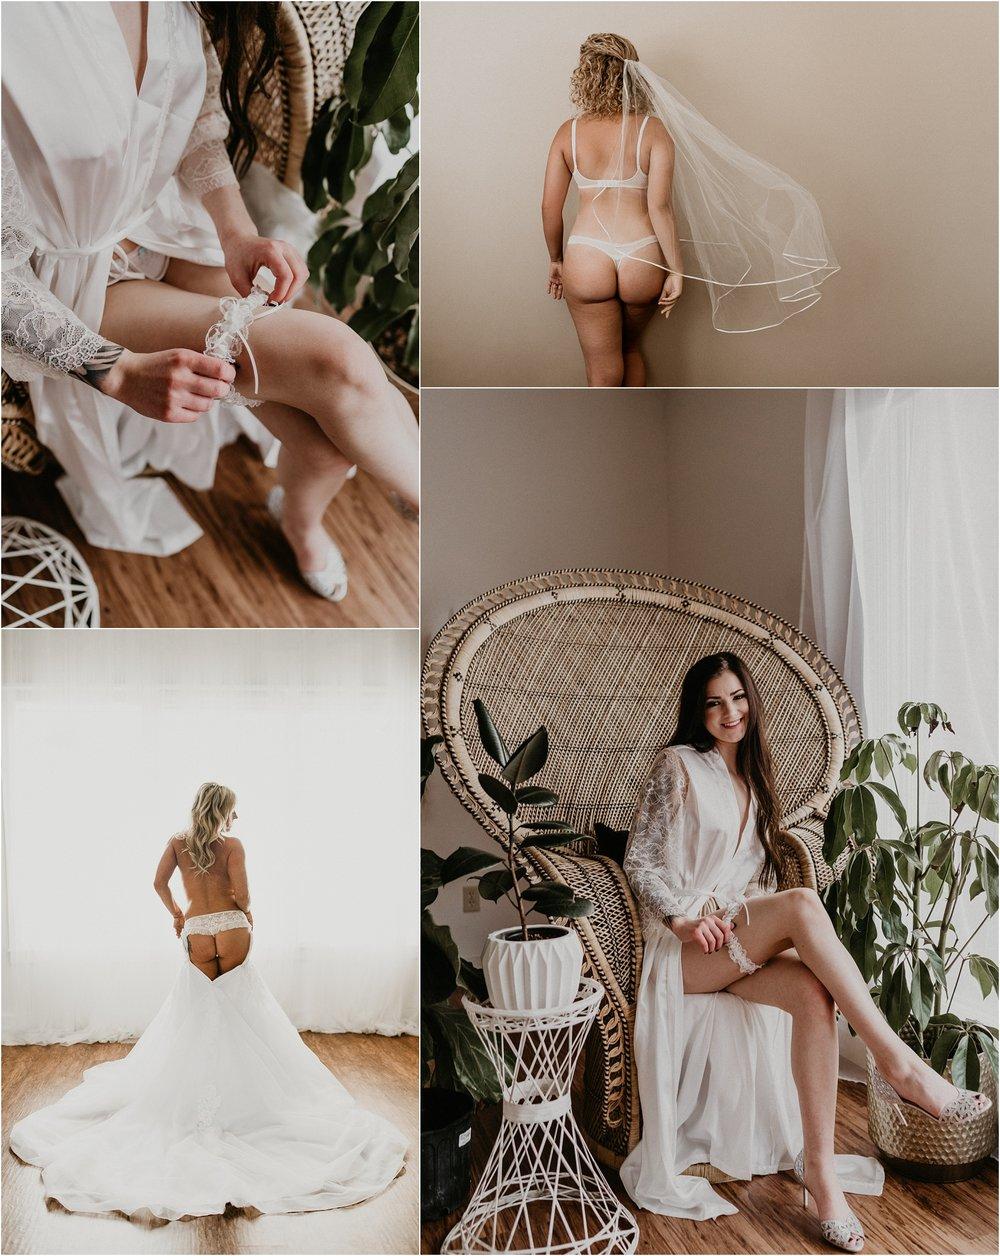 Boise, Idaho Boudoir Photographer Meridian Boudoir Photographers Bridal Boudoir Elegant Veil Shots Inspiration Boise Wedding Photographer Why Book Boudoir Session